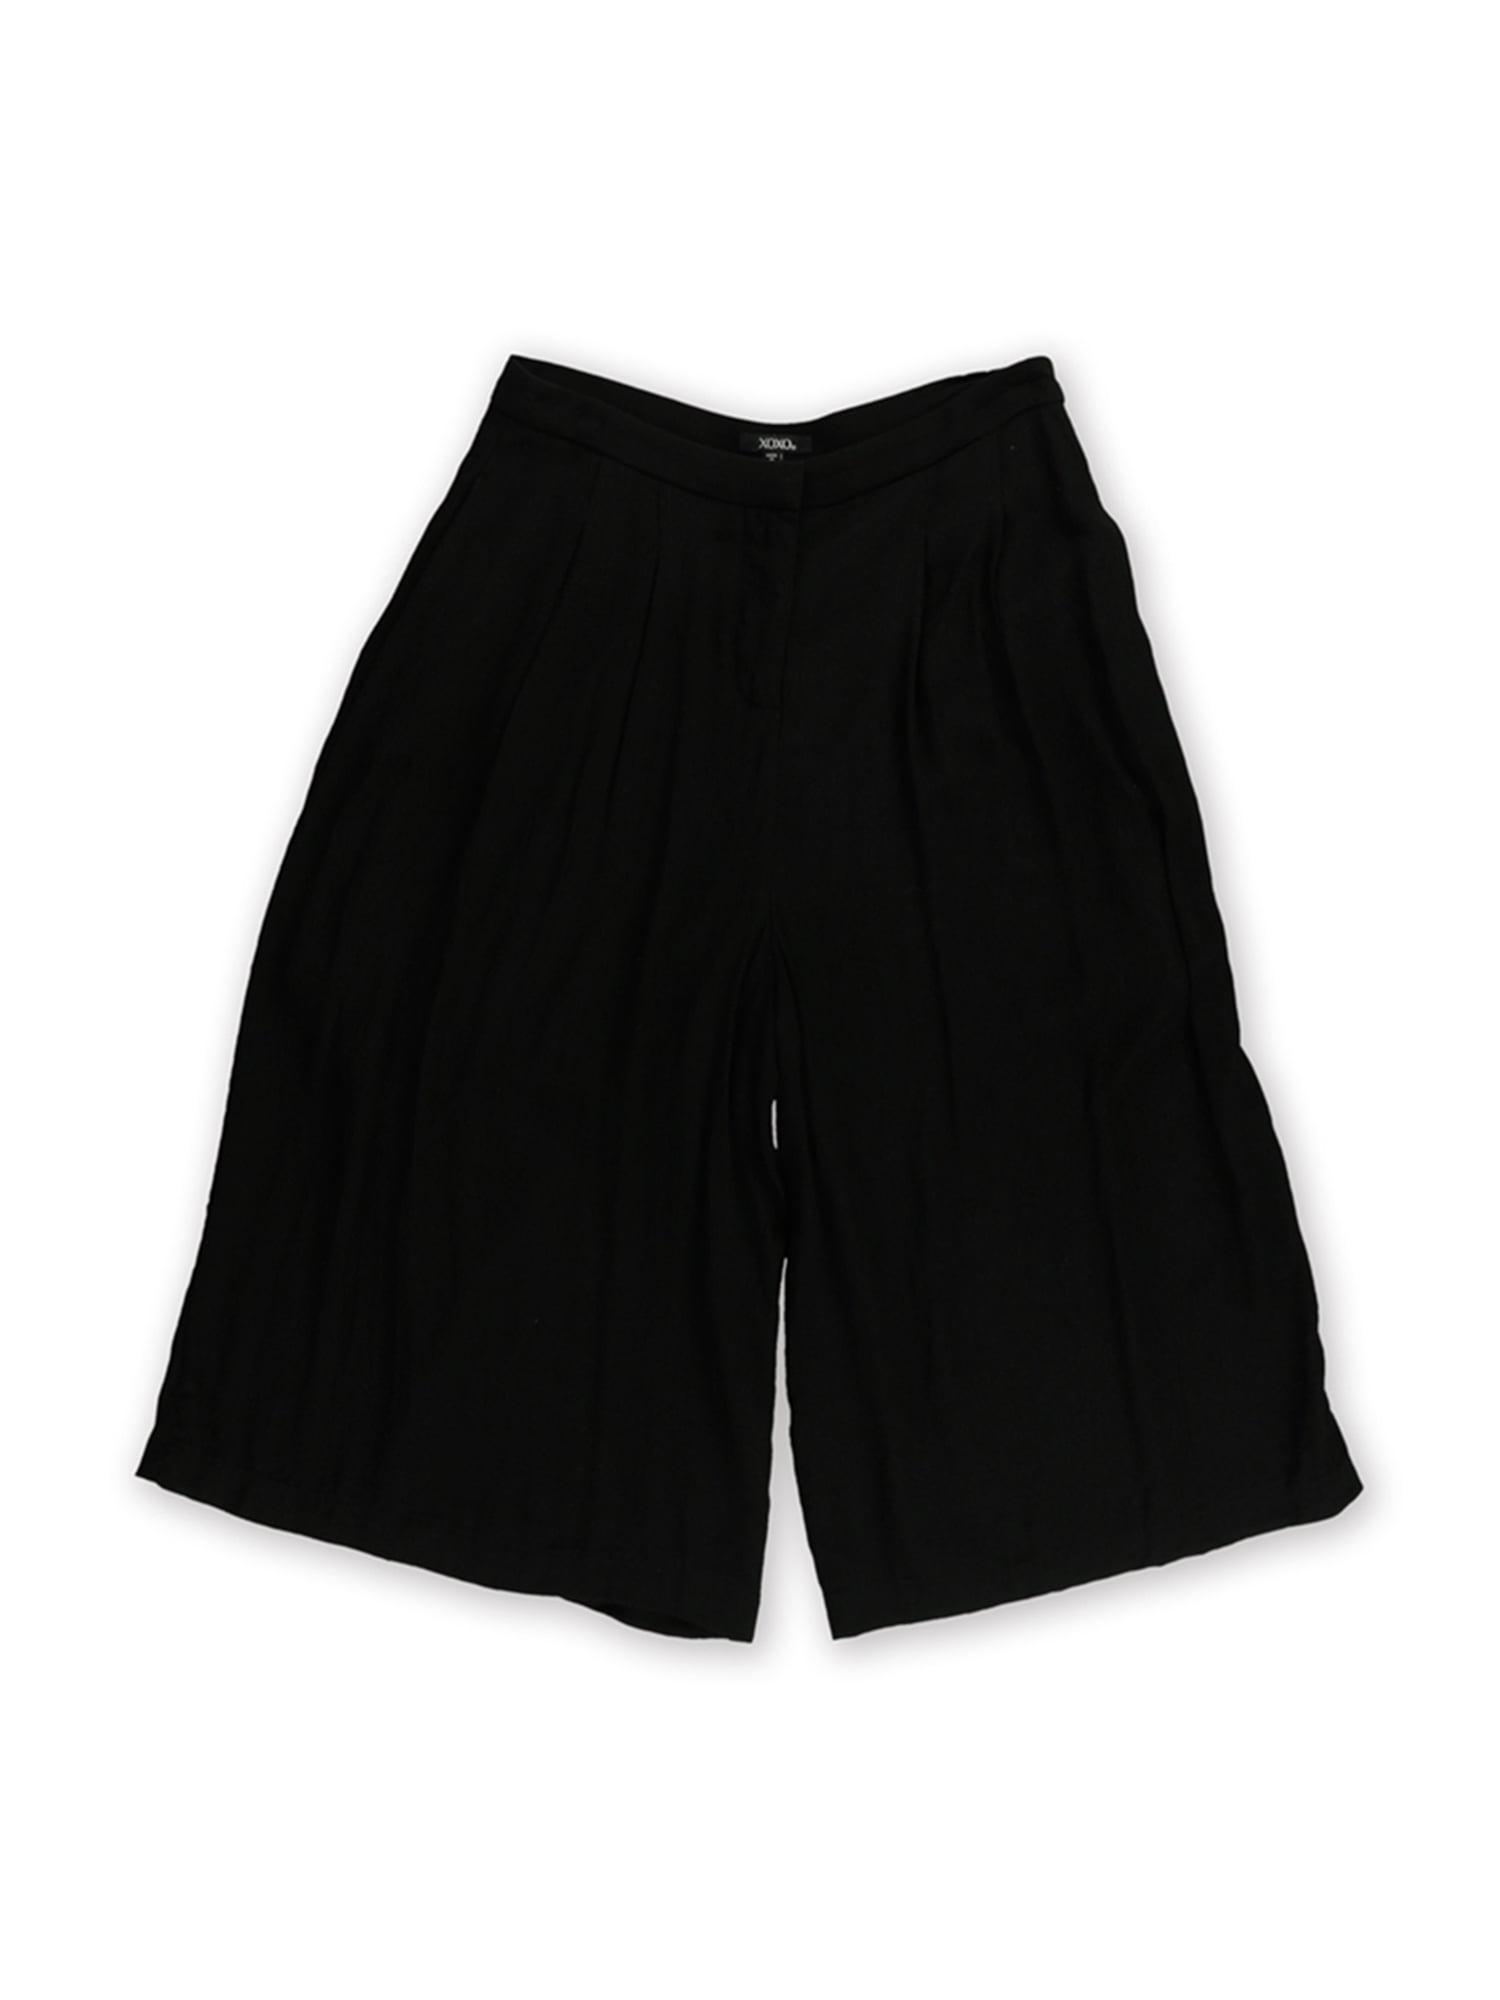 XOXO Womens Solid Culotte Dress Trousers bk 9/10x14 - Juniors